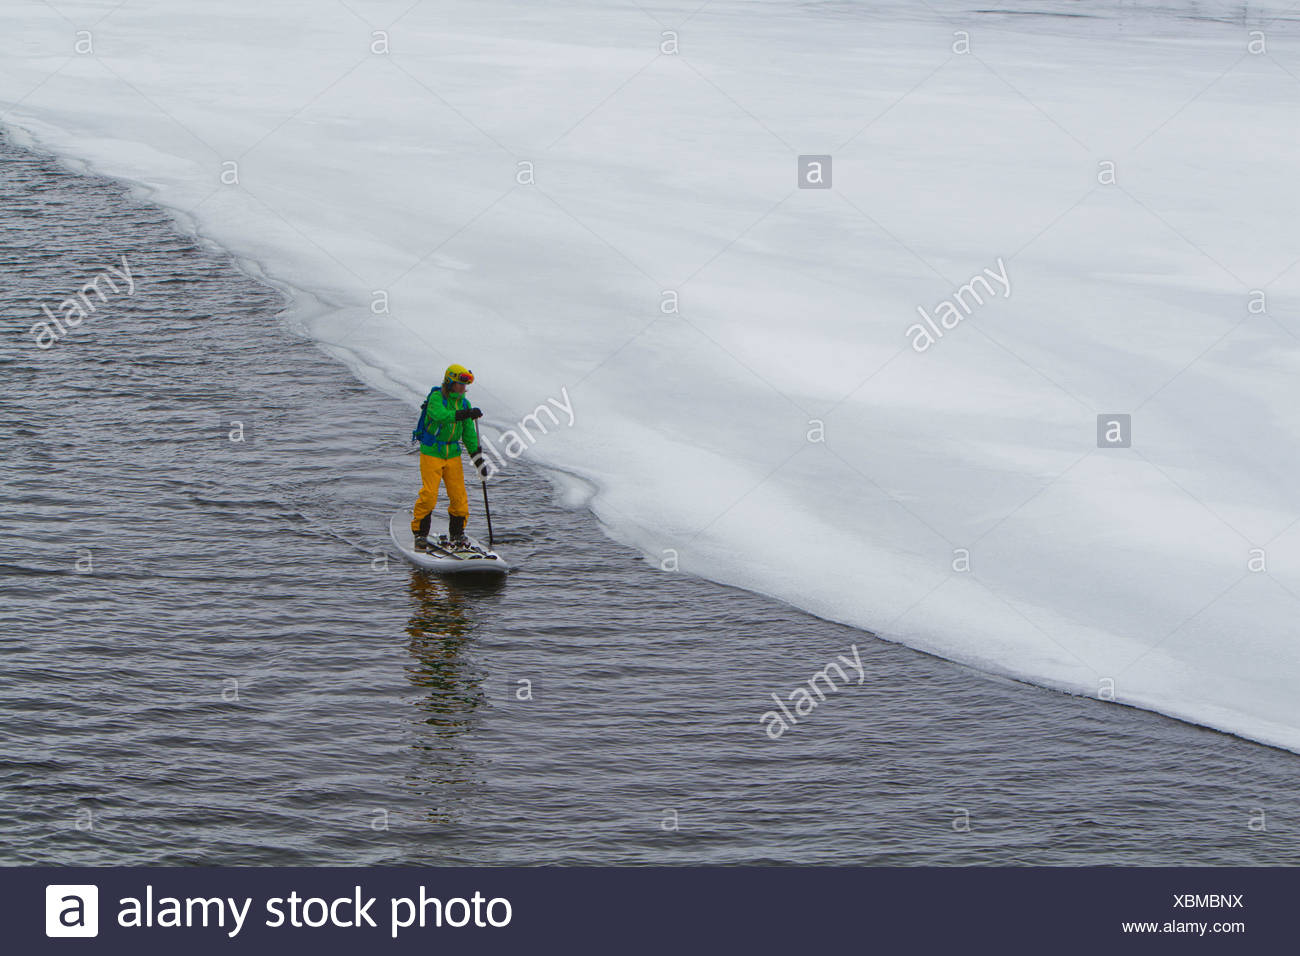 Norway, Narvik, Mature man paddling in polar ocean - Stock Image